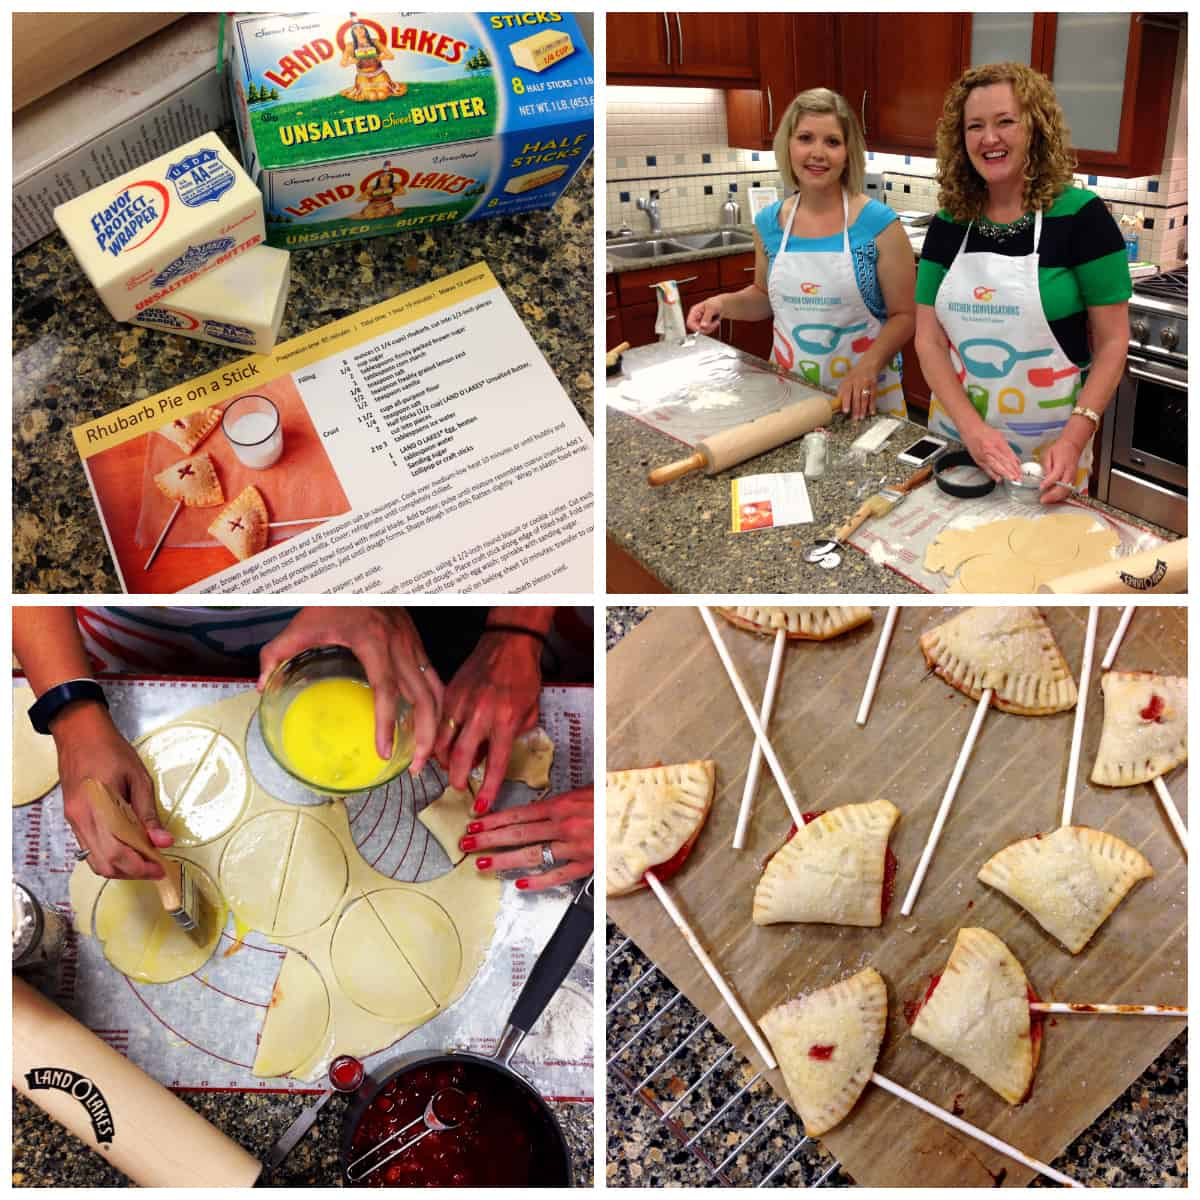 Simple Goodness on the Farm with Land O'Lakes - afarmgirlsdabbles.com #kitchenconvo #rhubarb #pie